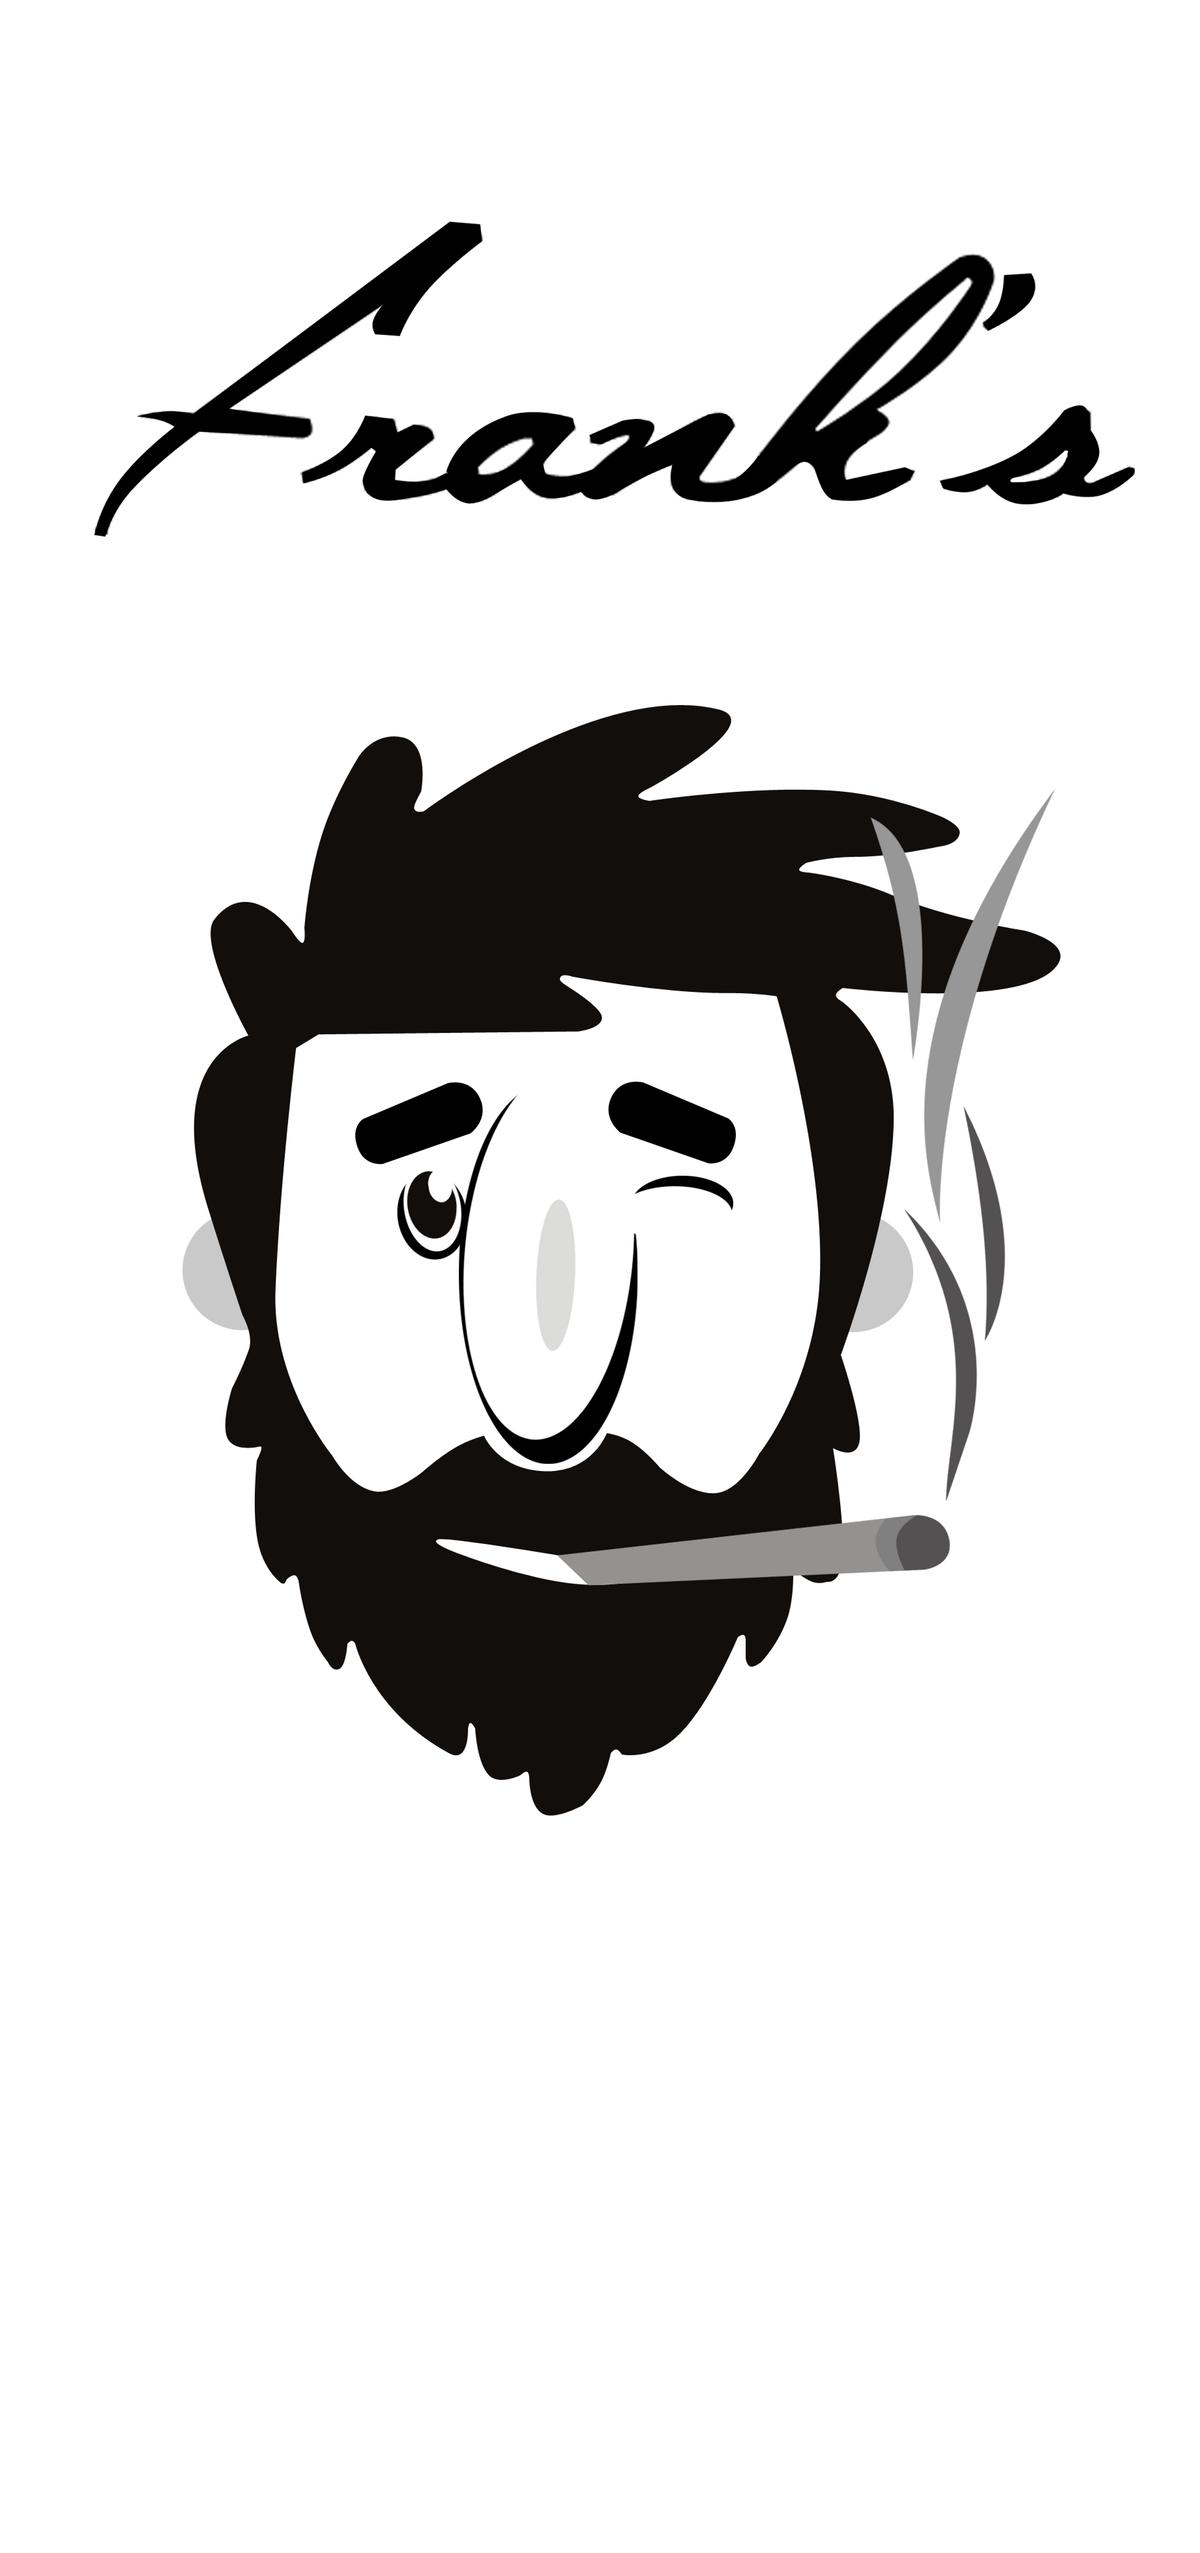 FP - Smoking Man Image